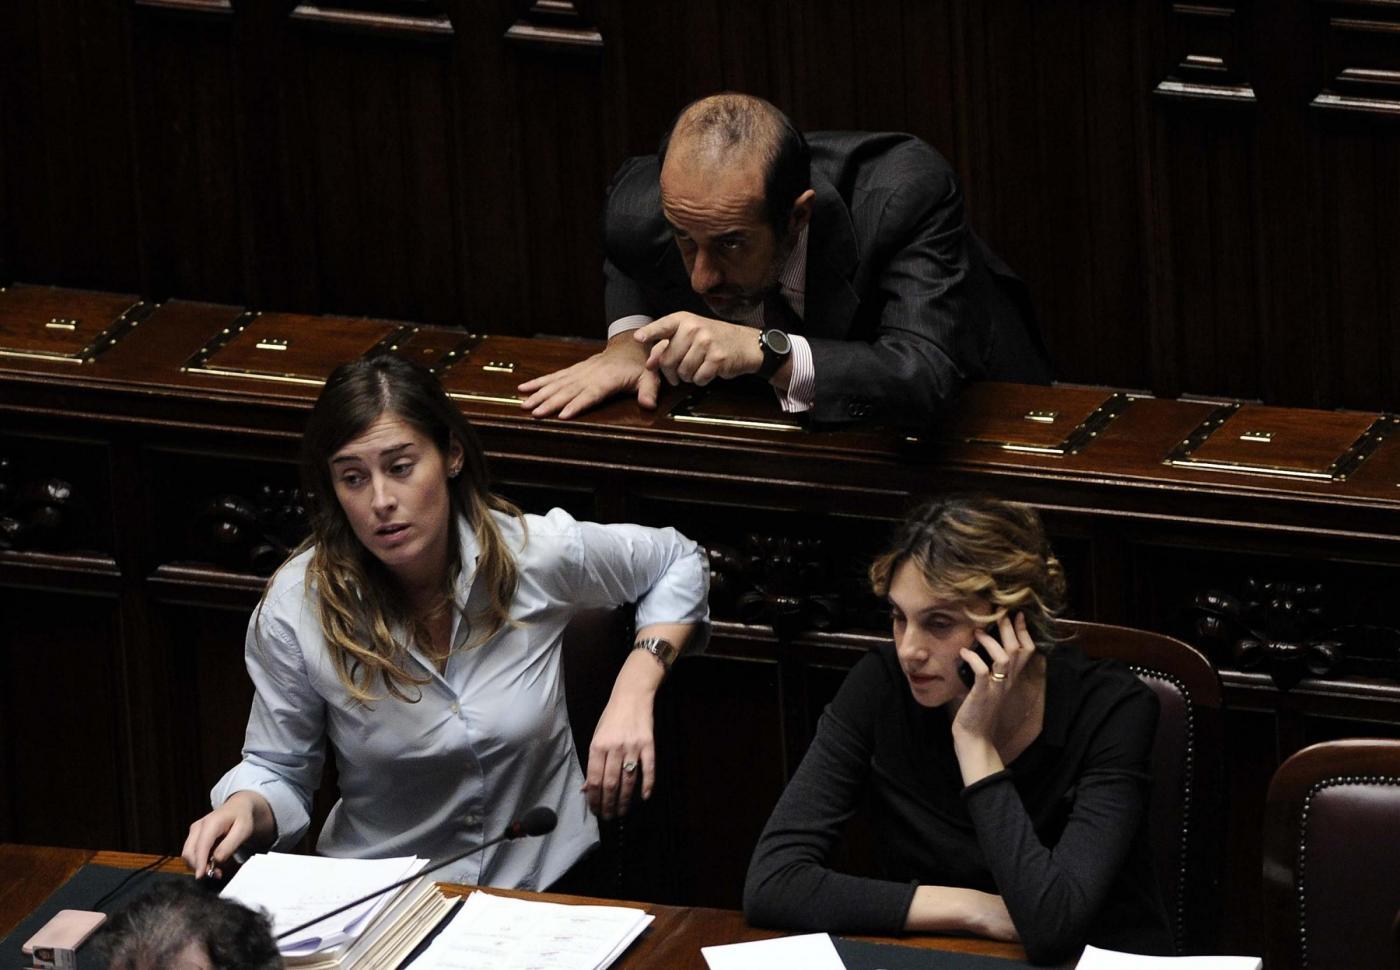 I 20 nuovi parlamentari del pd di renzi foto 1 di 14 for Parlamentari del pd